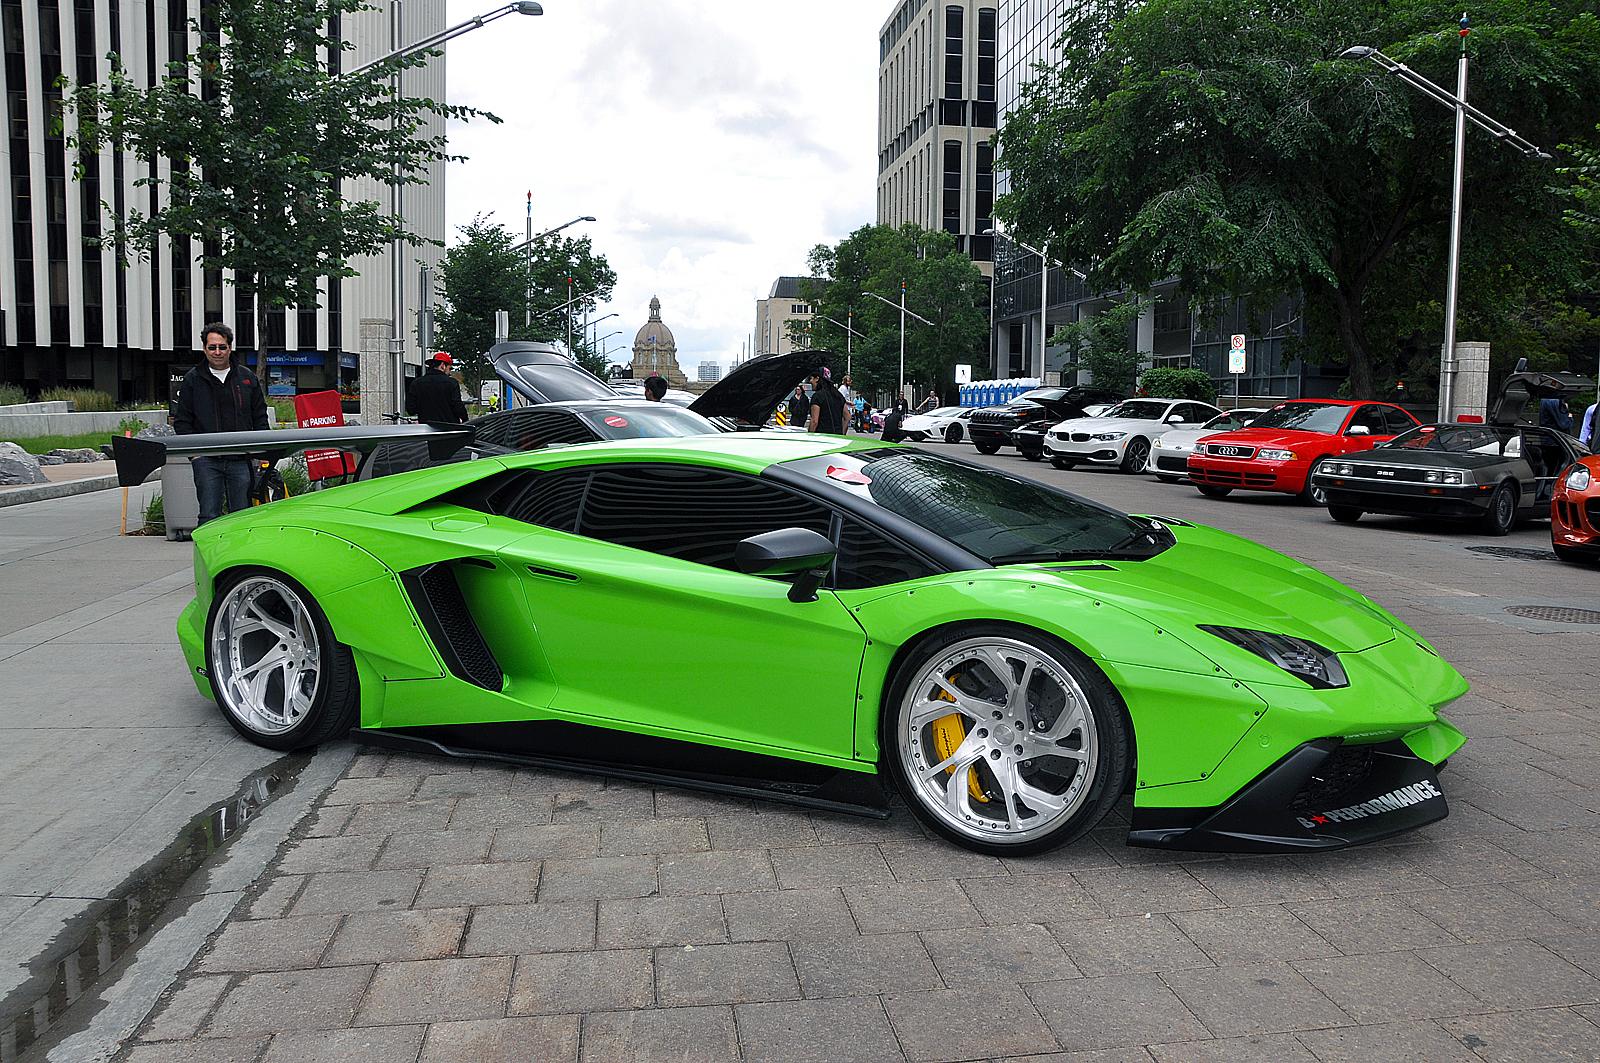 Liberty Walk Lamborghini Aventador in Downtown Edmonton